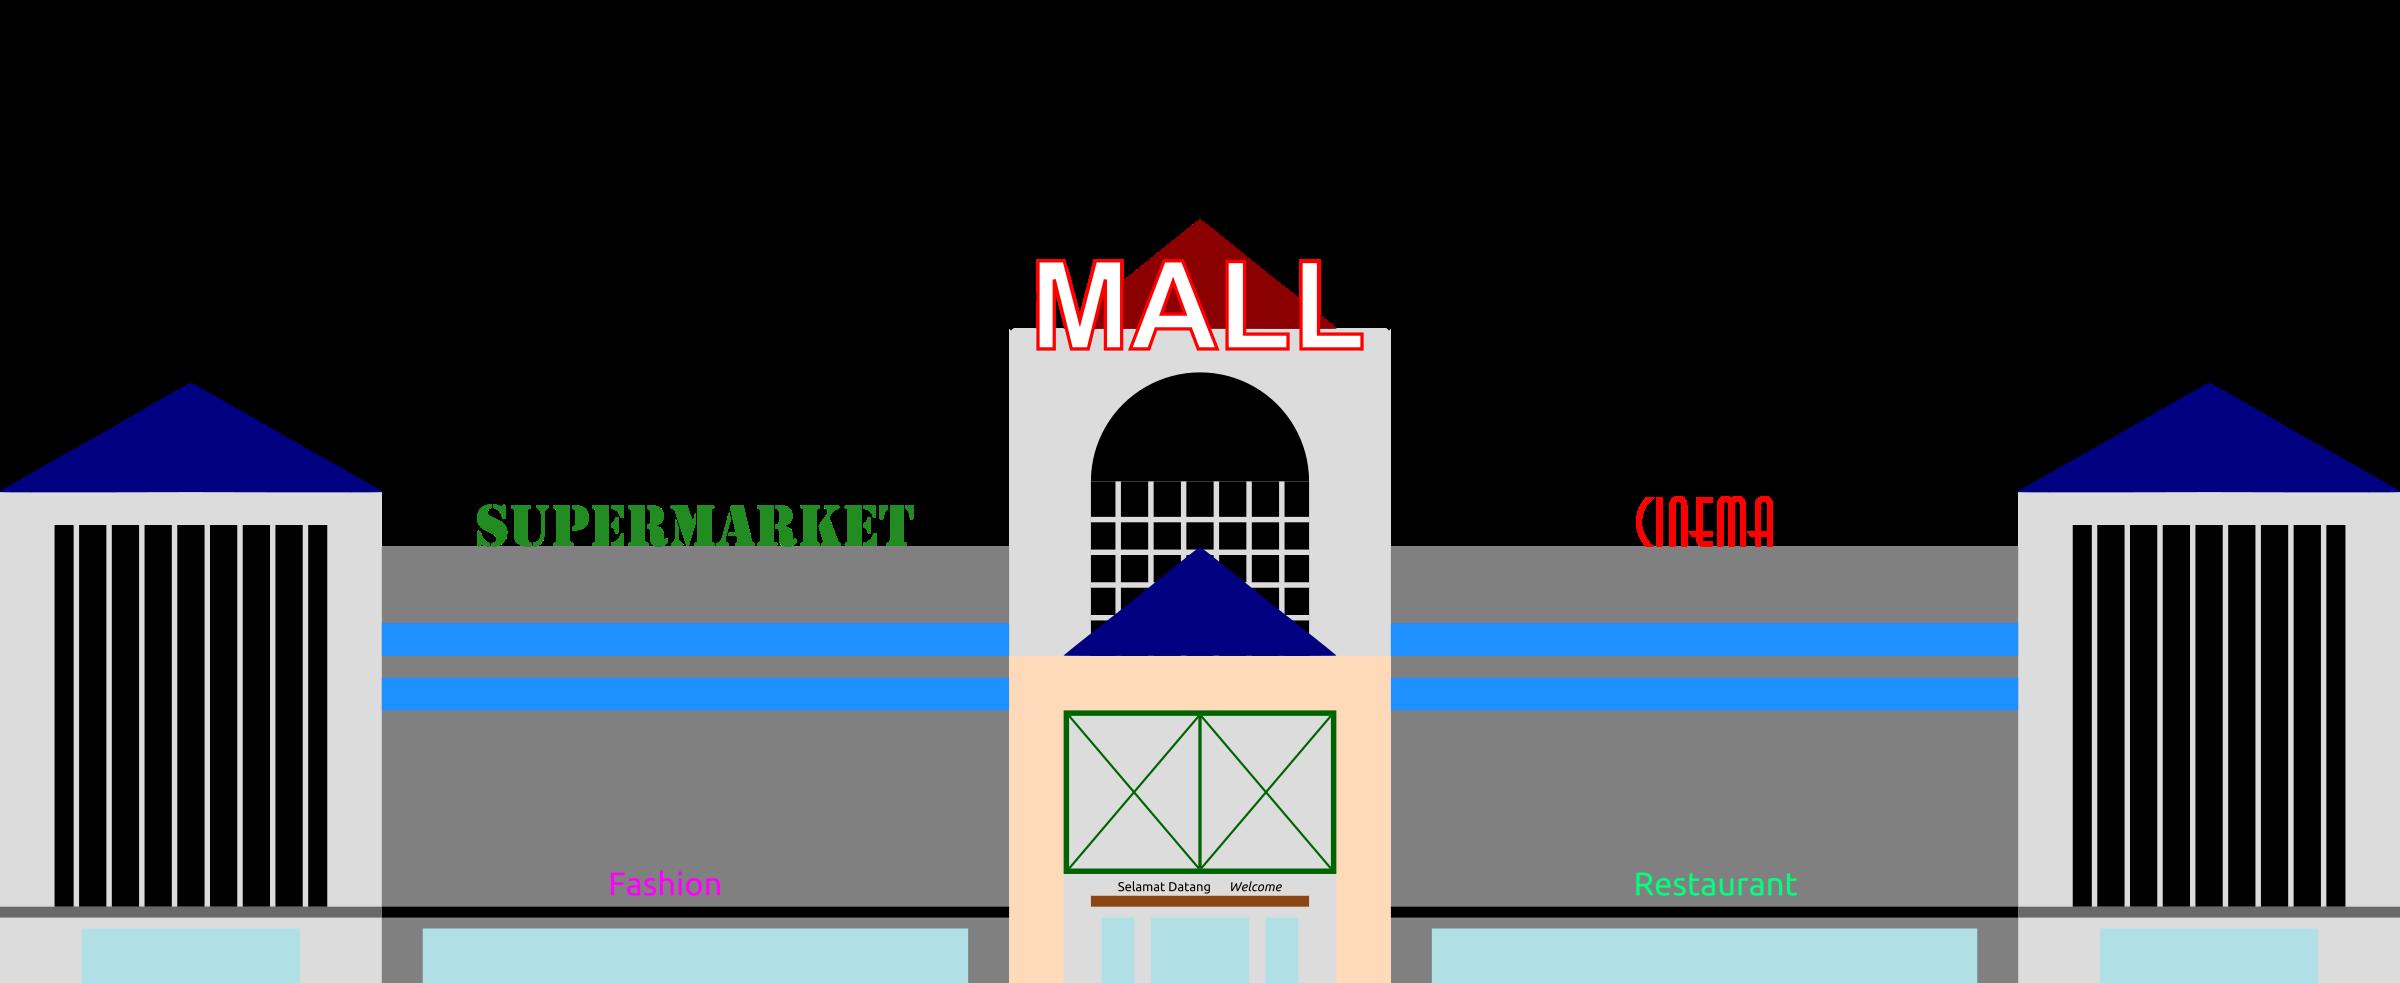 retail store clip art free - photo #35